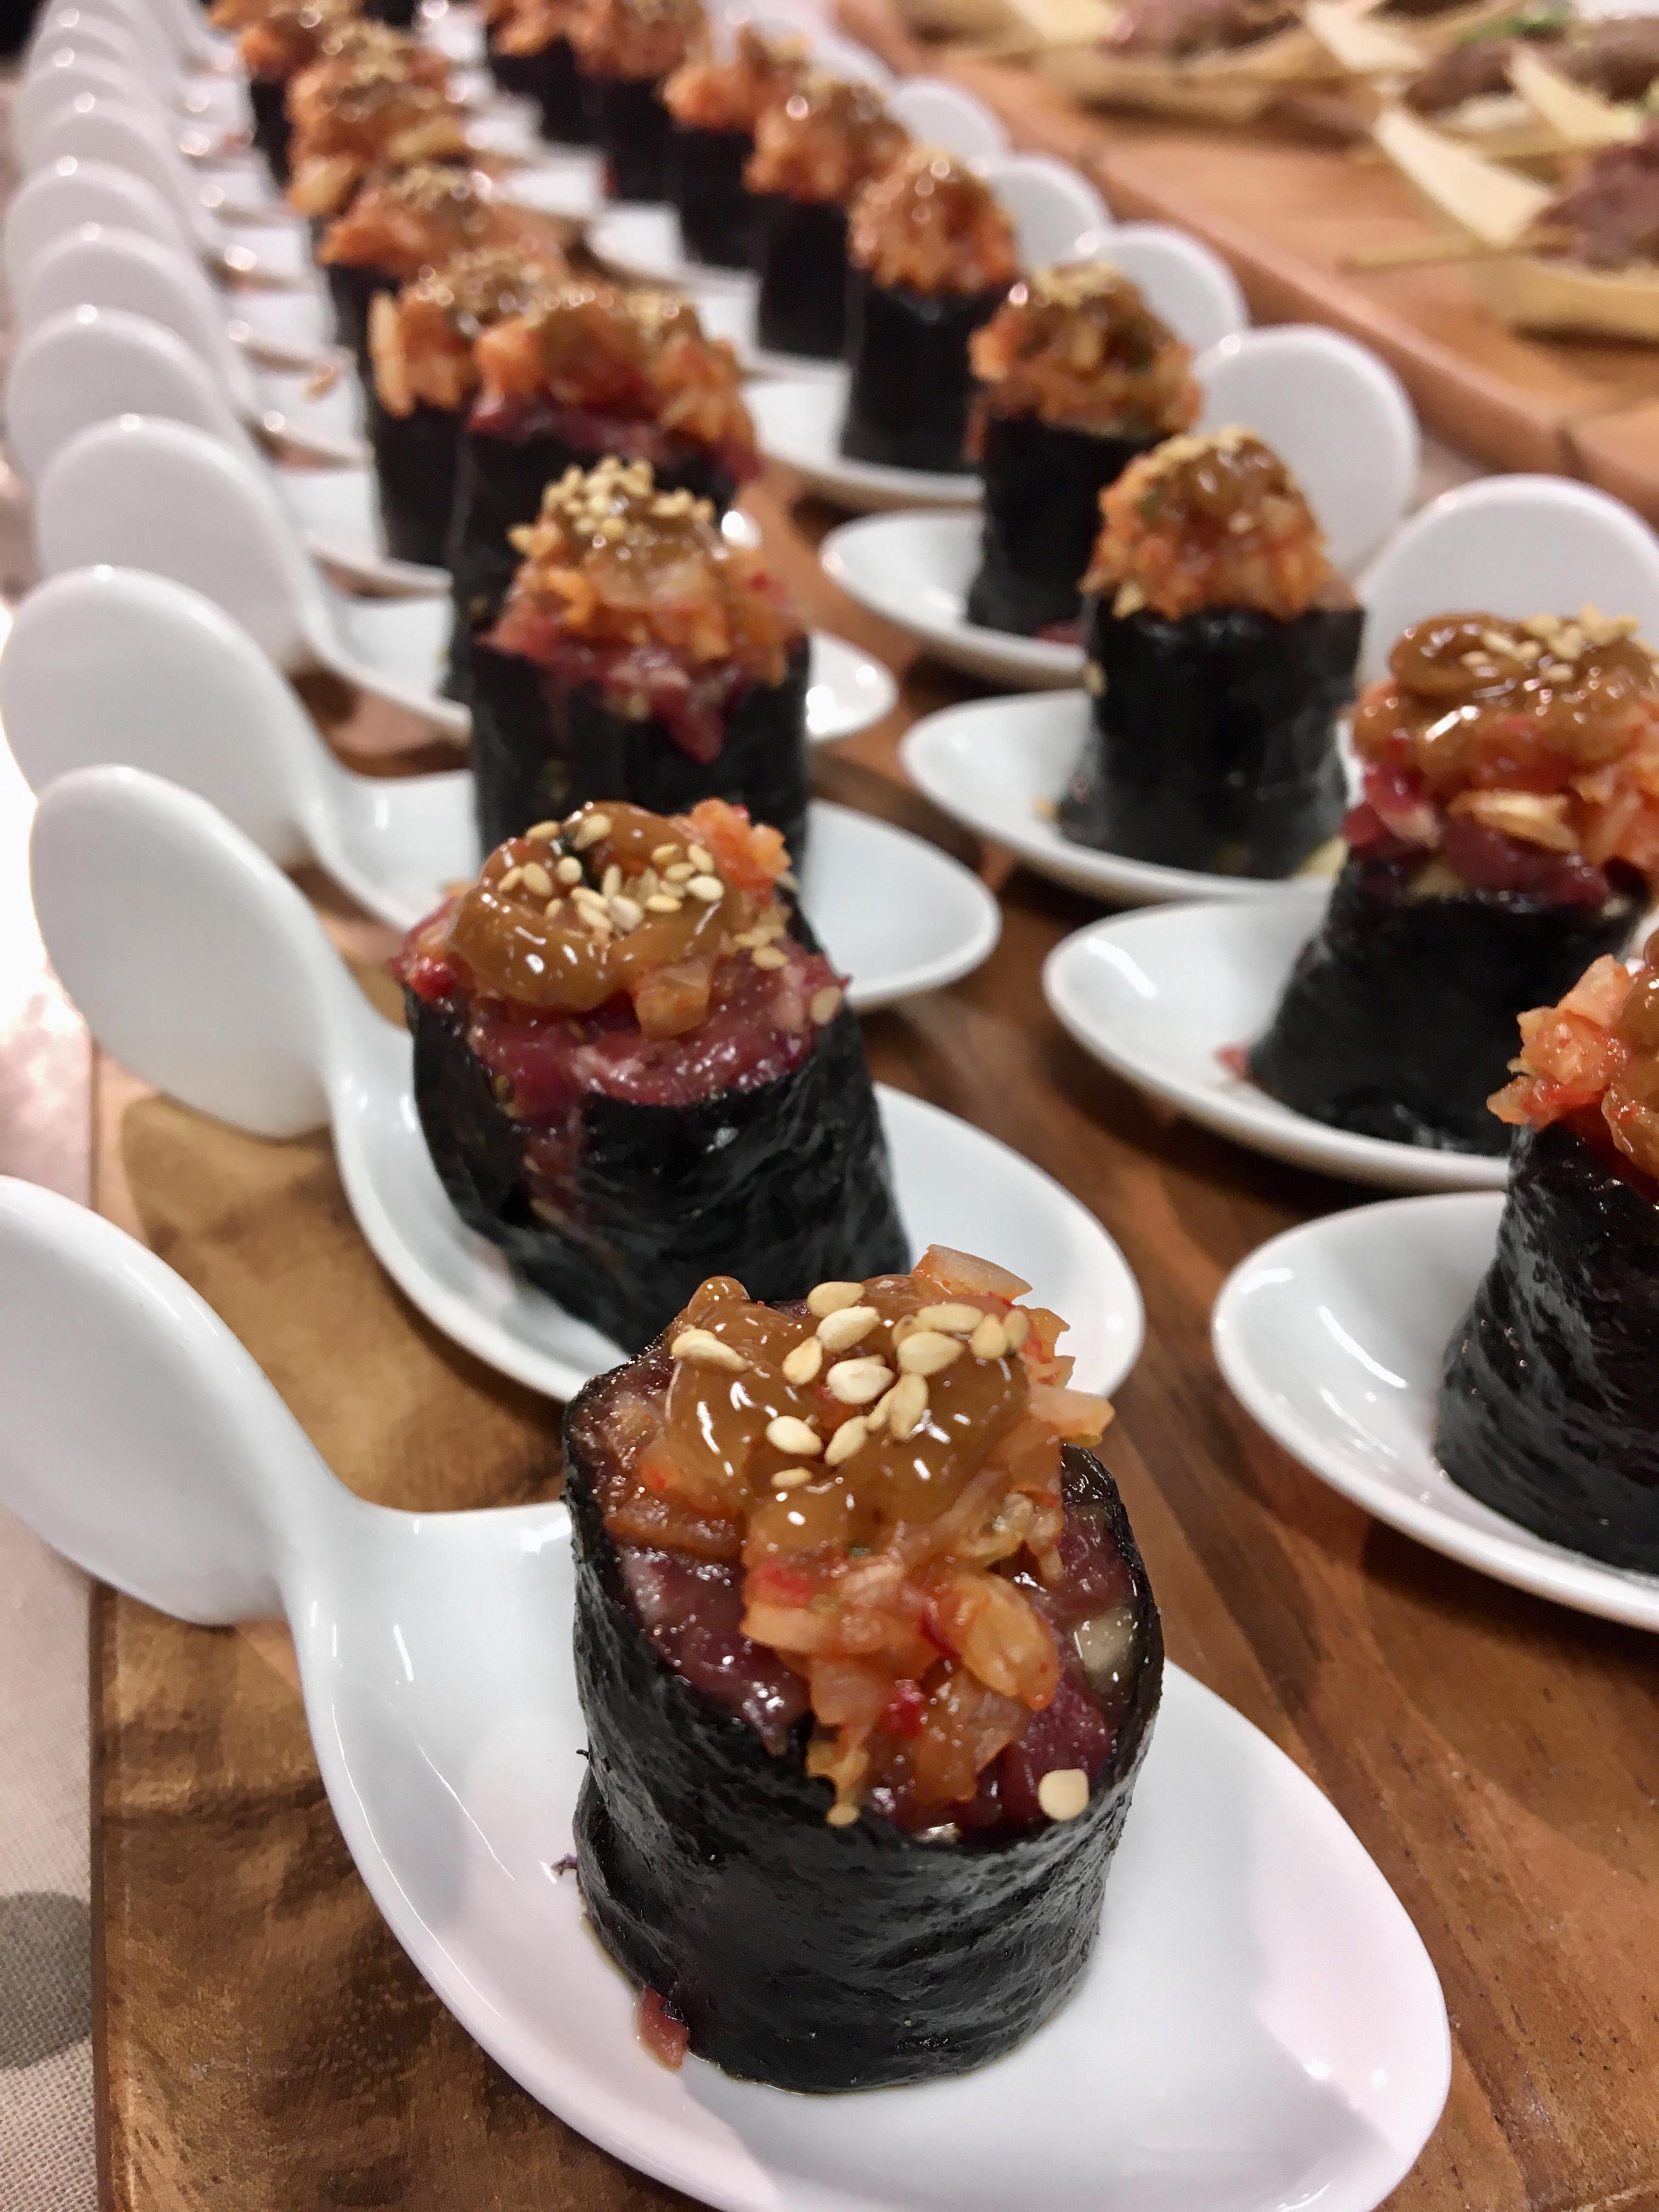 Finger Food With Jolanta – Korean-style Beef Tartare With Kimchi And Miso Mayo